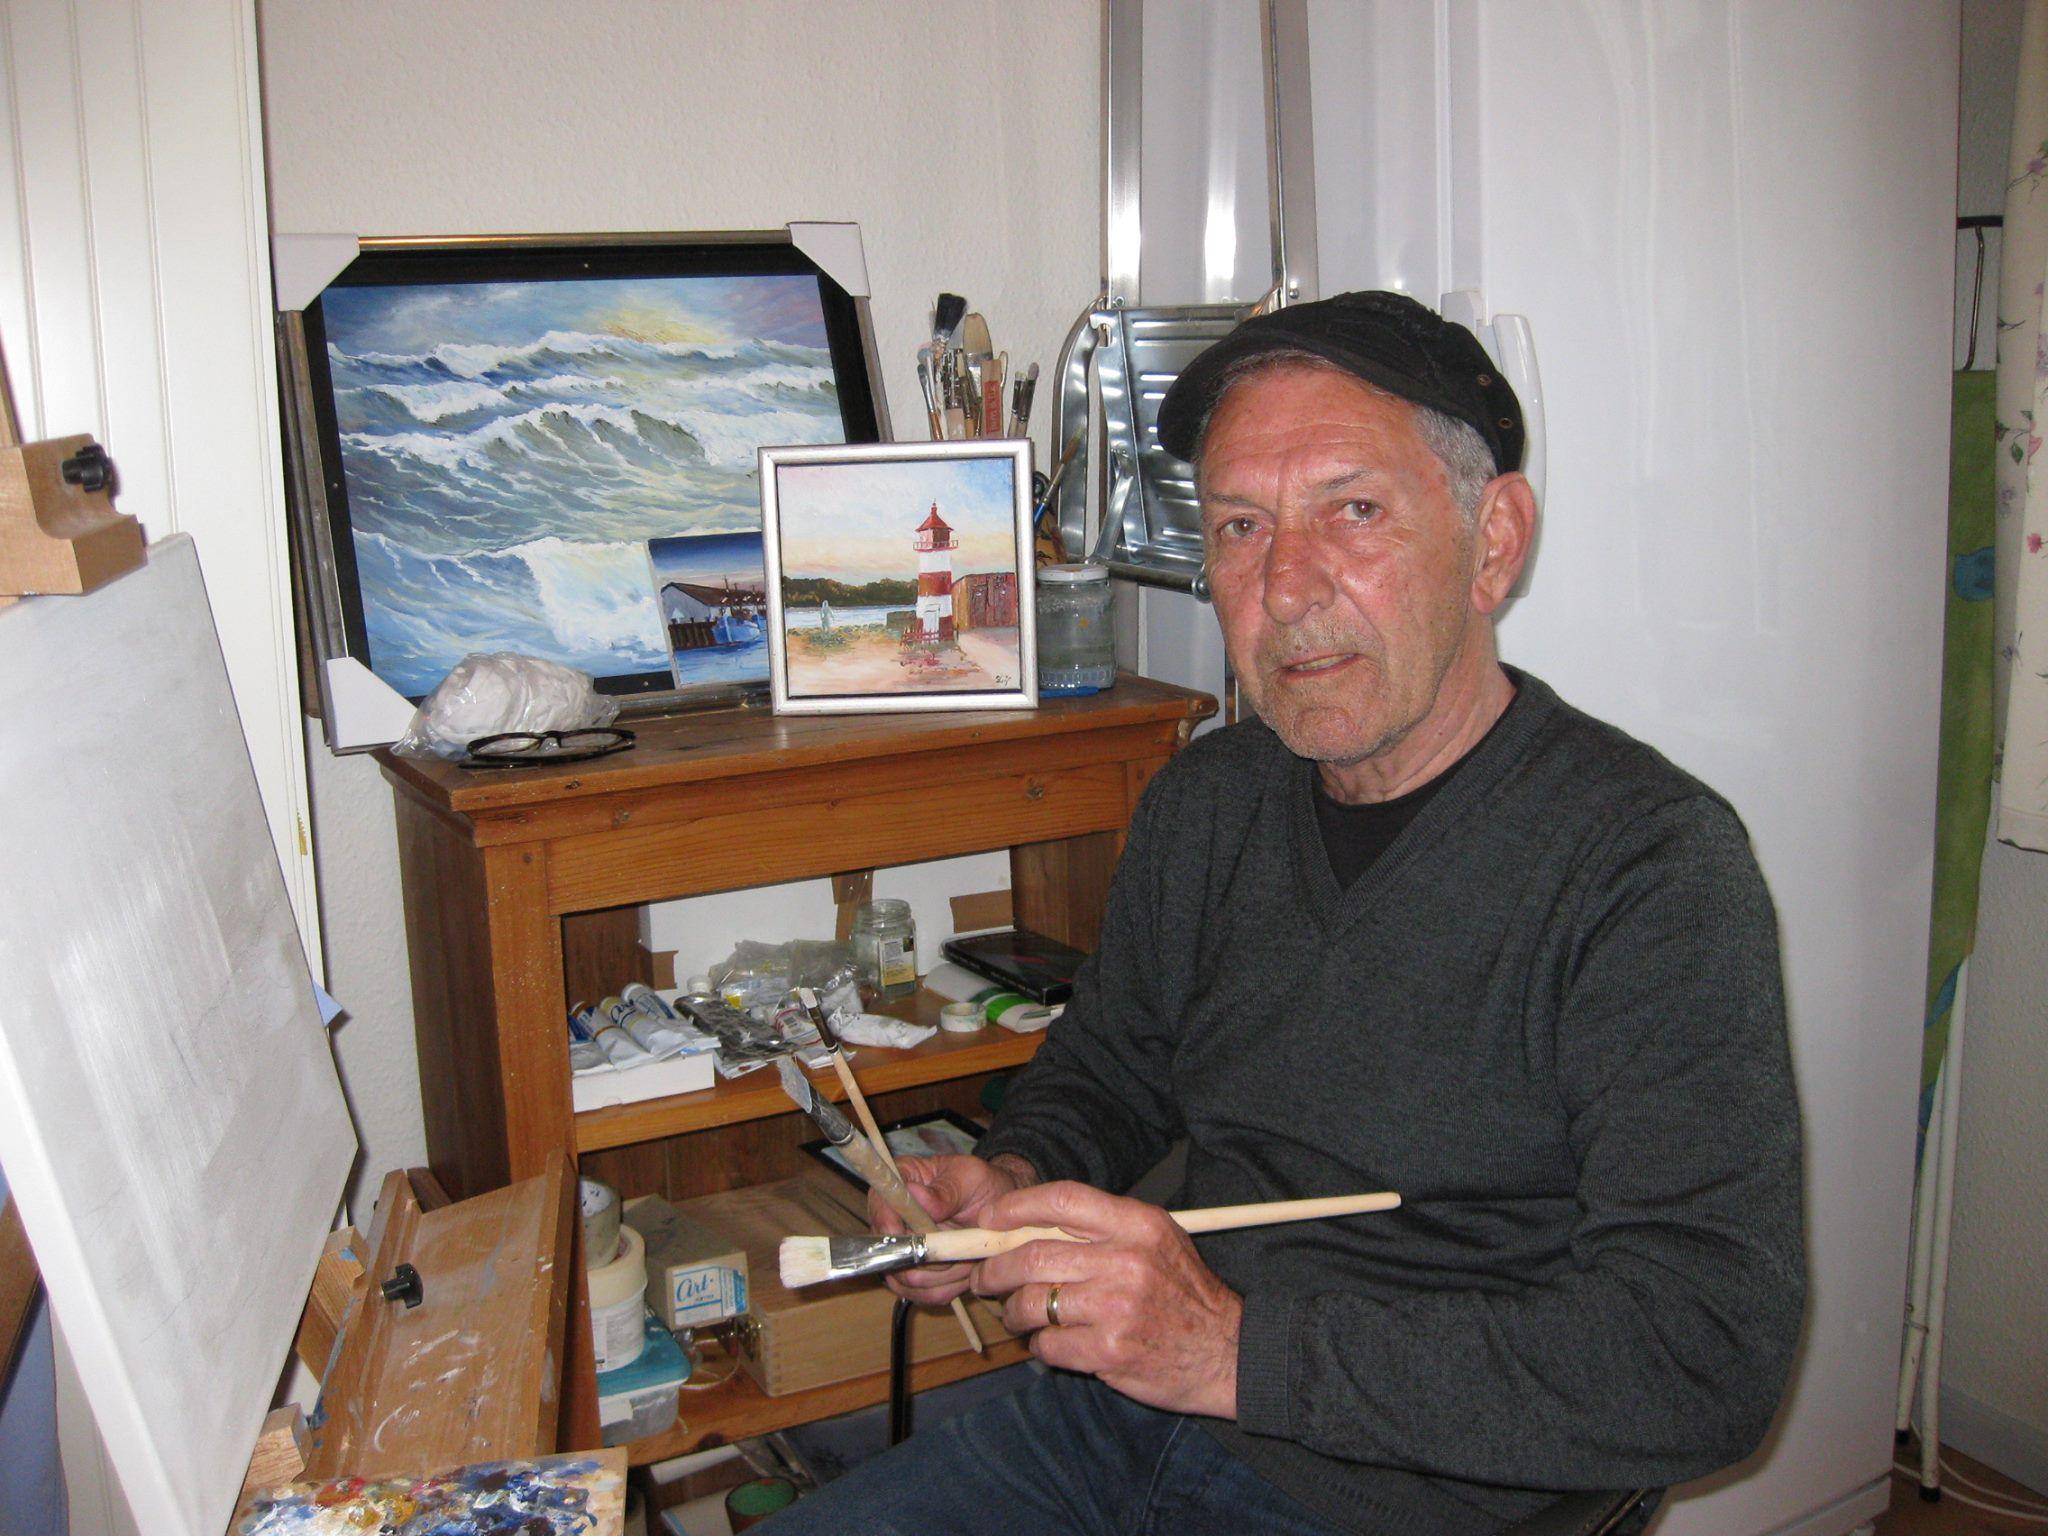 Kunstmaler Leif Larsen i sit Atelier i sit hjem i Gløngøre. Leif Larsen er født og opvokset i Lønstrup, men har igennem mange år boet i Gløngøre. Leif Larsen maler fortrinsvis malerier fra vestkysten og Limfjorden